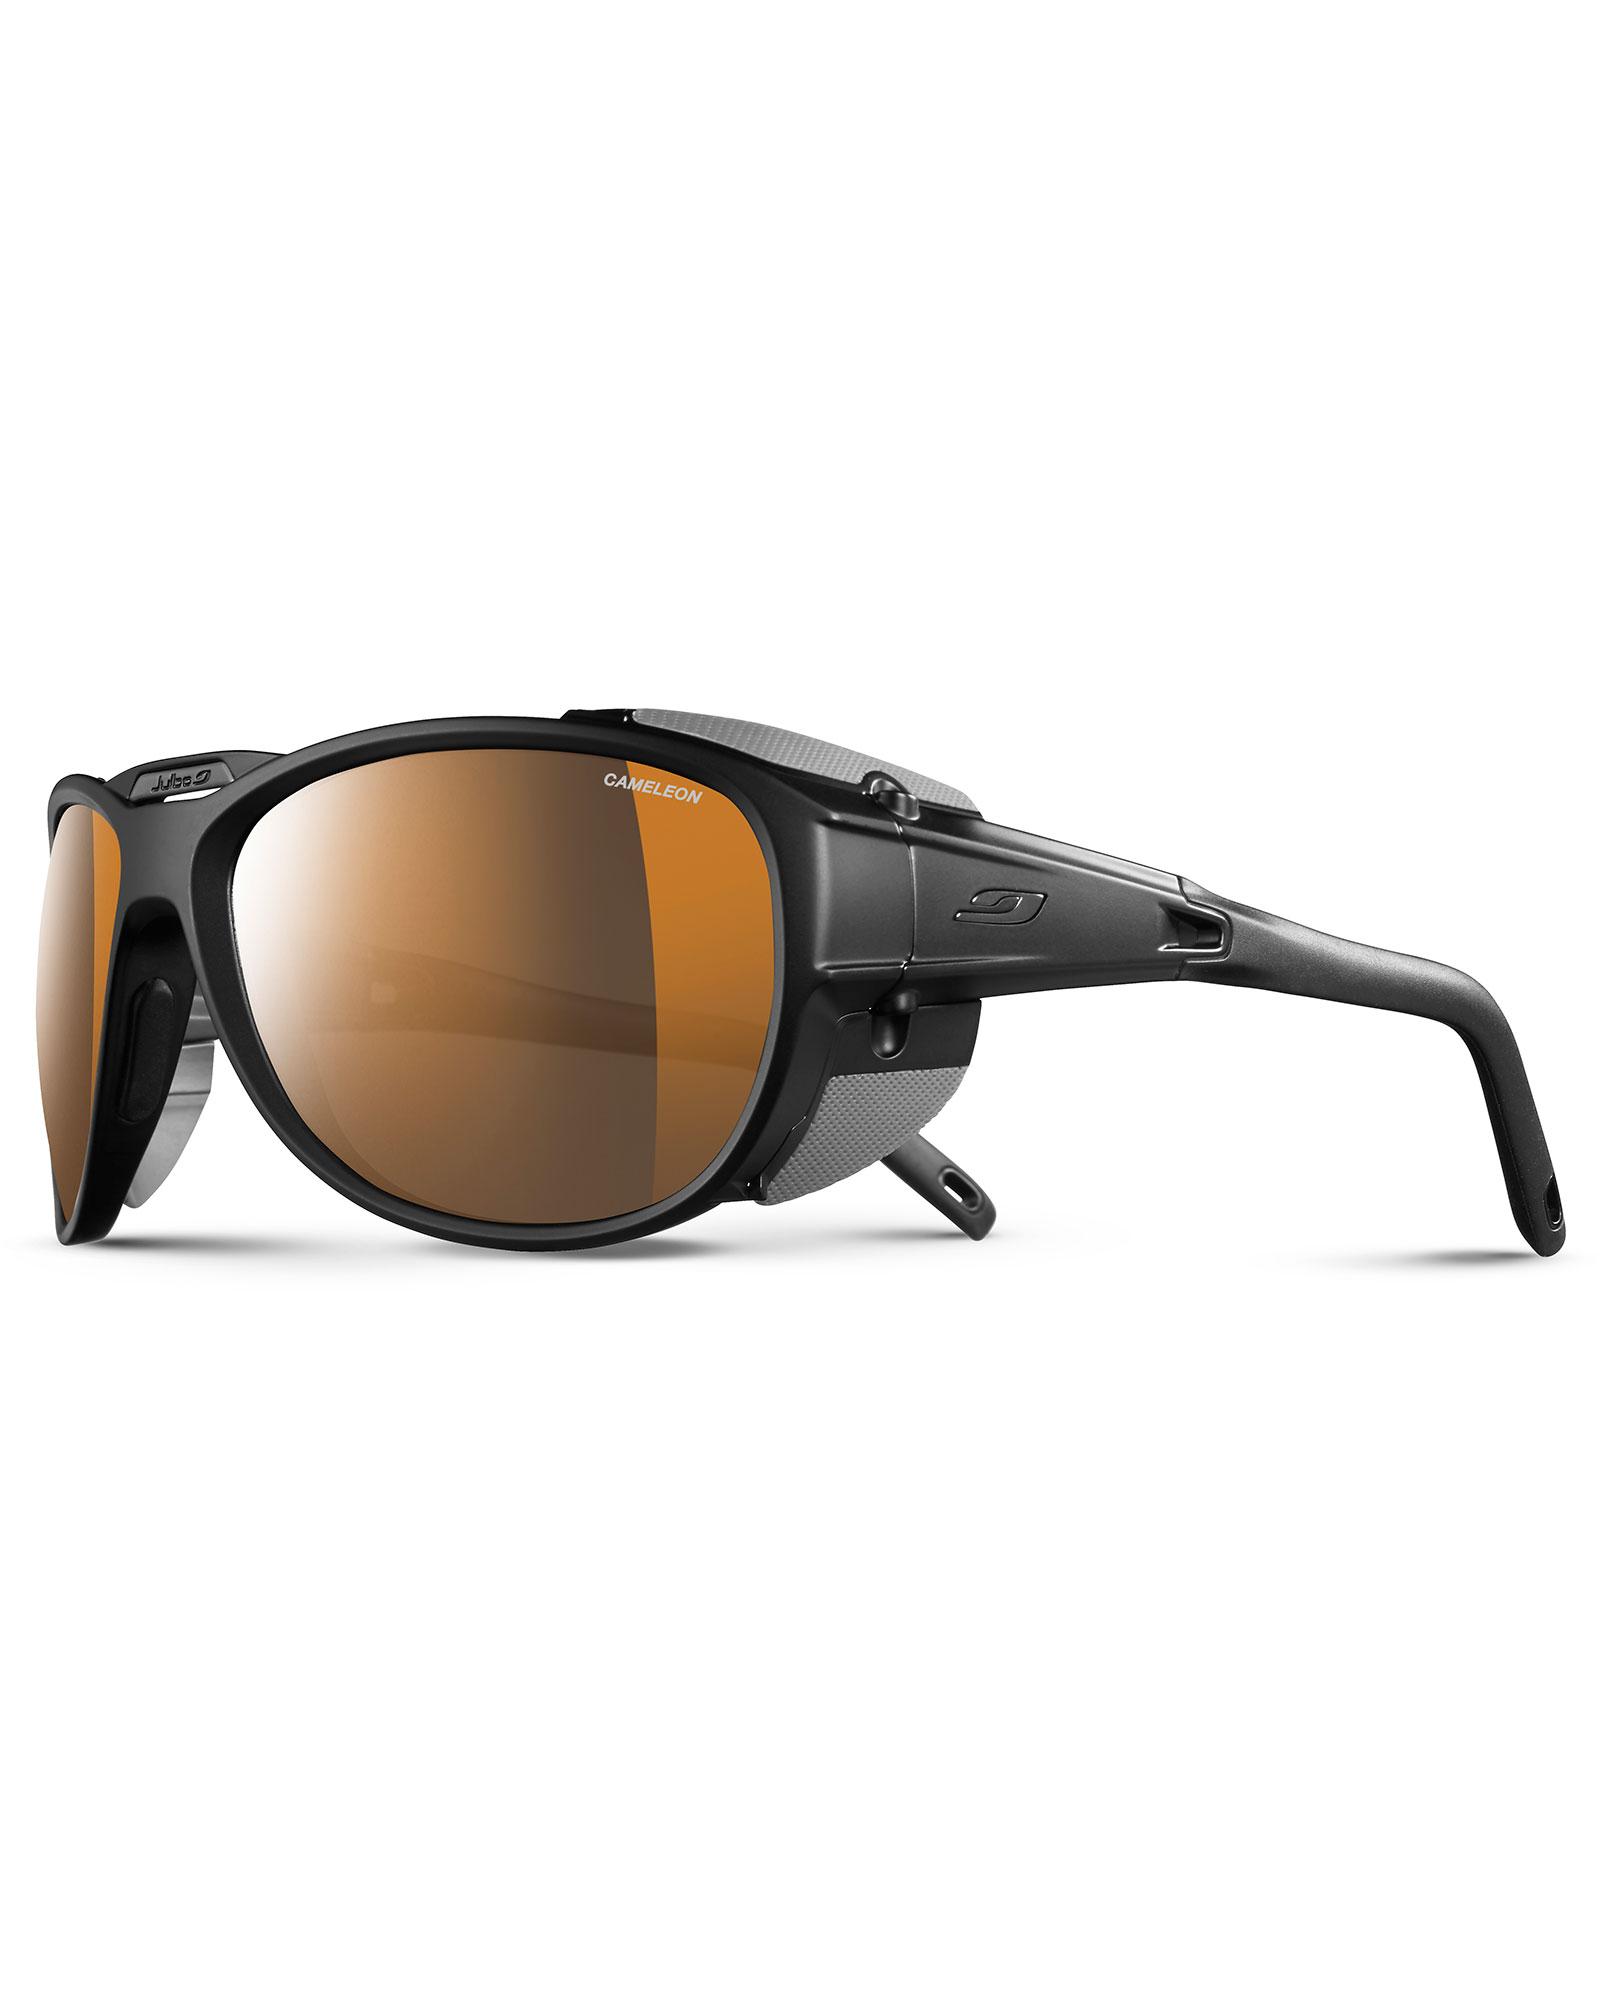 Julbo Explorer 2.0 Chameleon 2-4 / Polarised Sunglasses 0